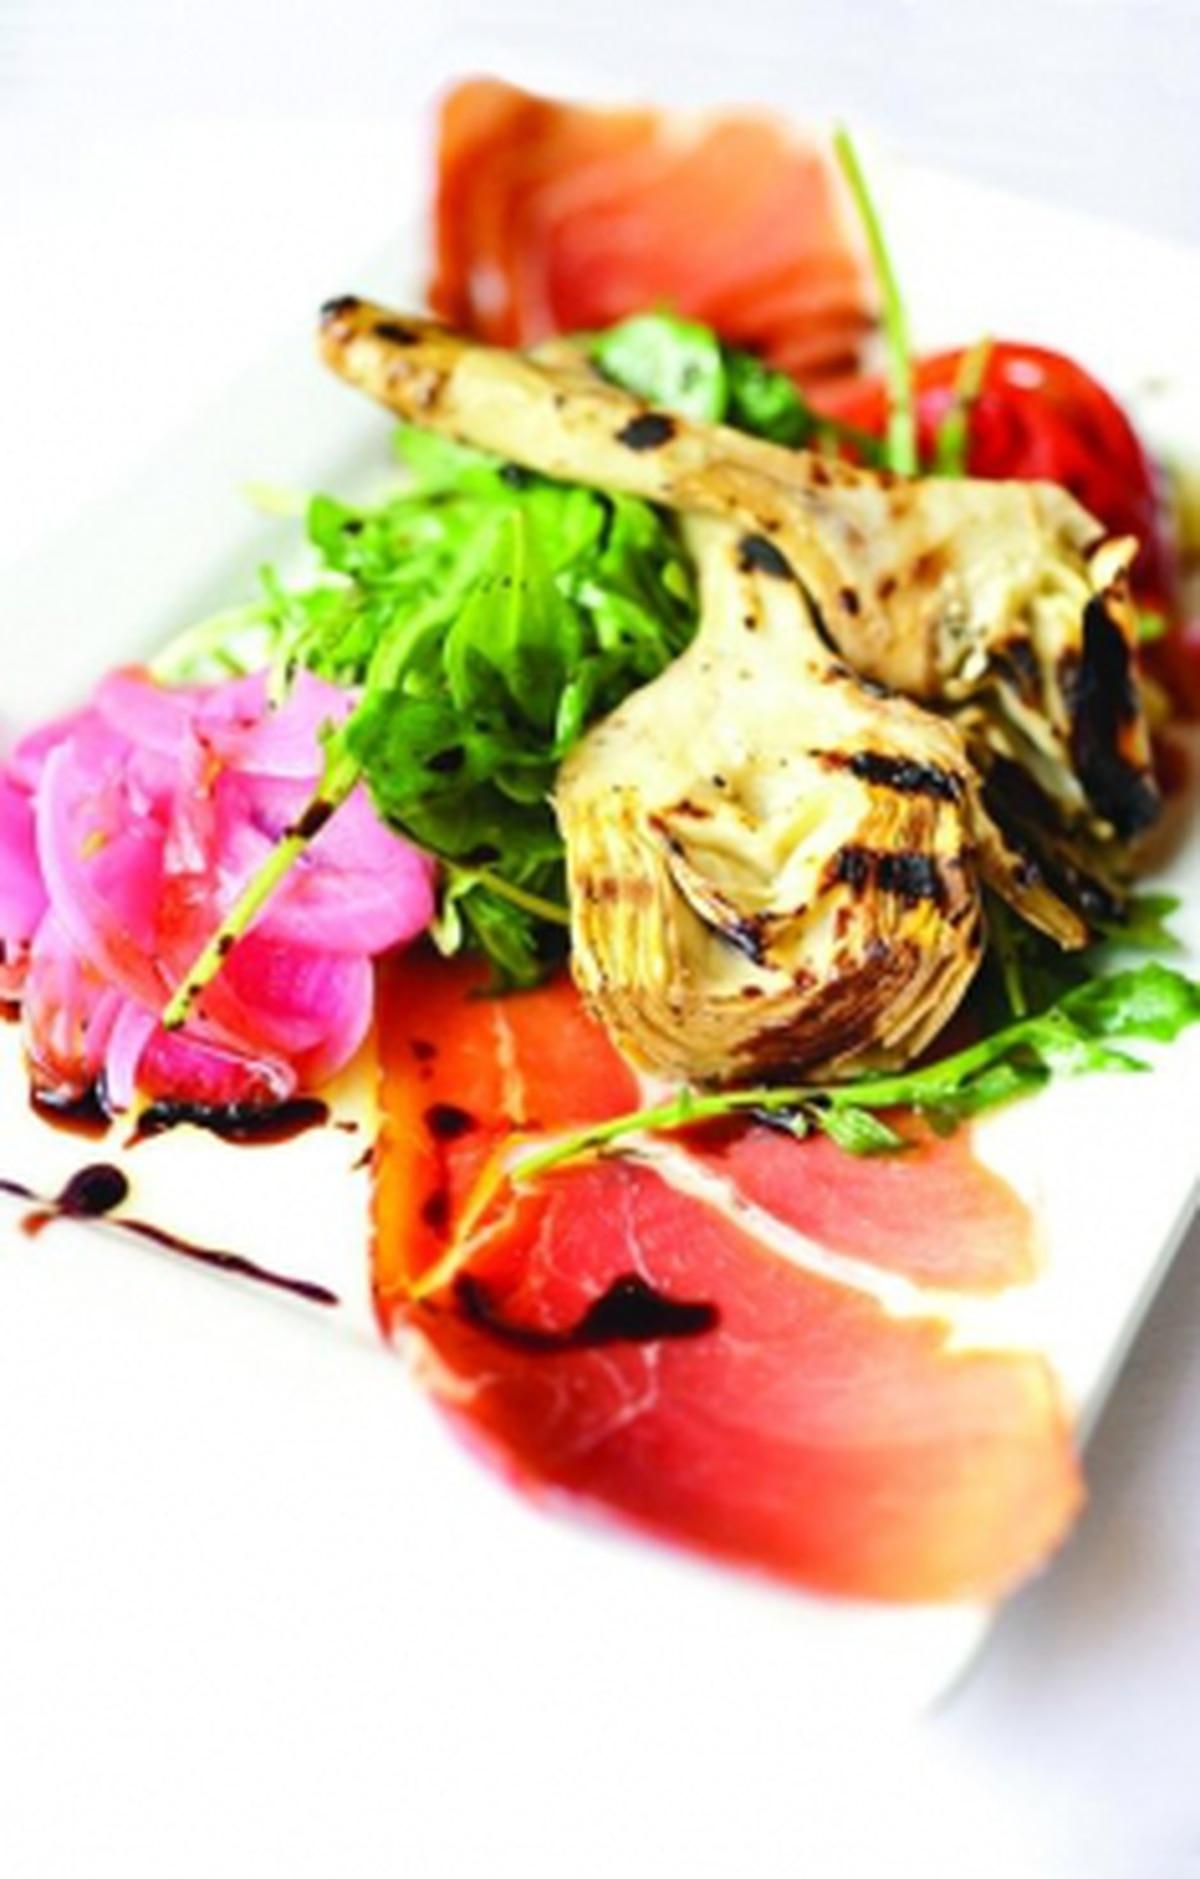 Grilled artichoke salad with arugula, jamón serrano and aged sherry vinegar reduction Photo: Joy Godfrey